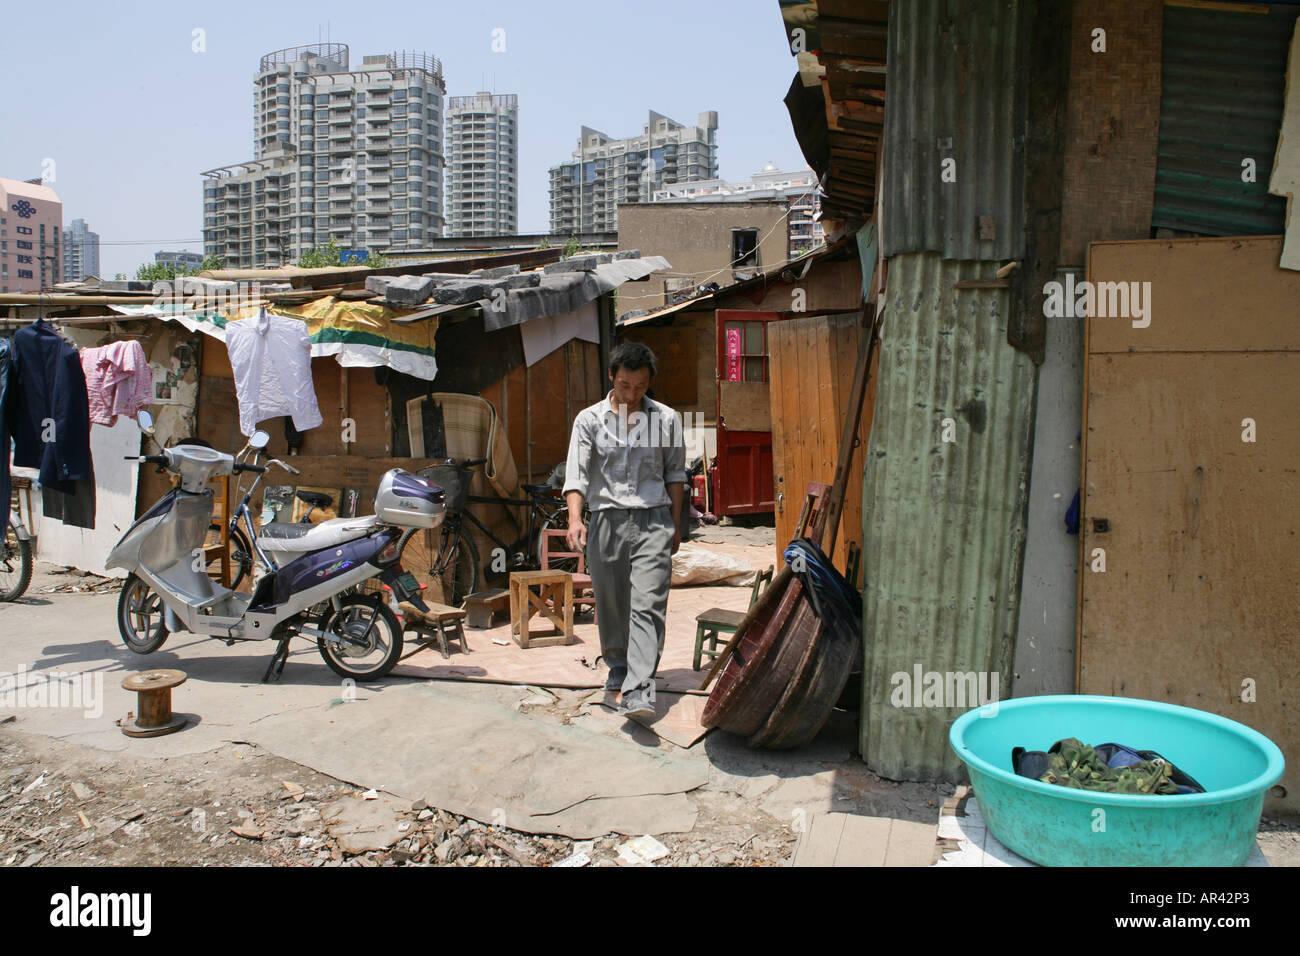 Abriss, demolitian Hongkou, Redevelopment area, Abrissgebiet, living amongst demolished  houses, Wanderarbeiter Stock Photo